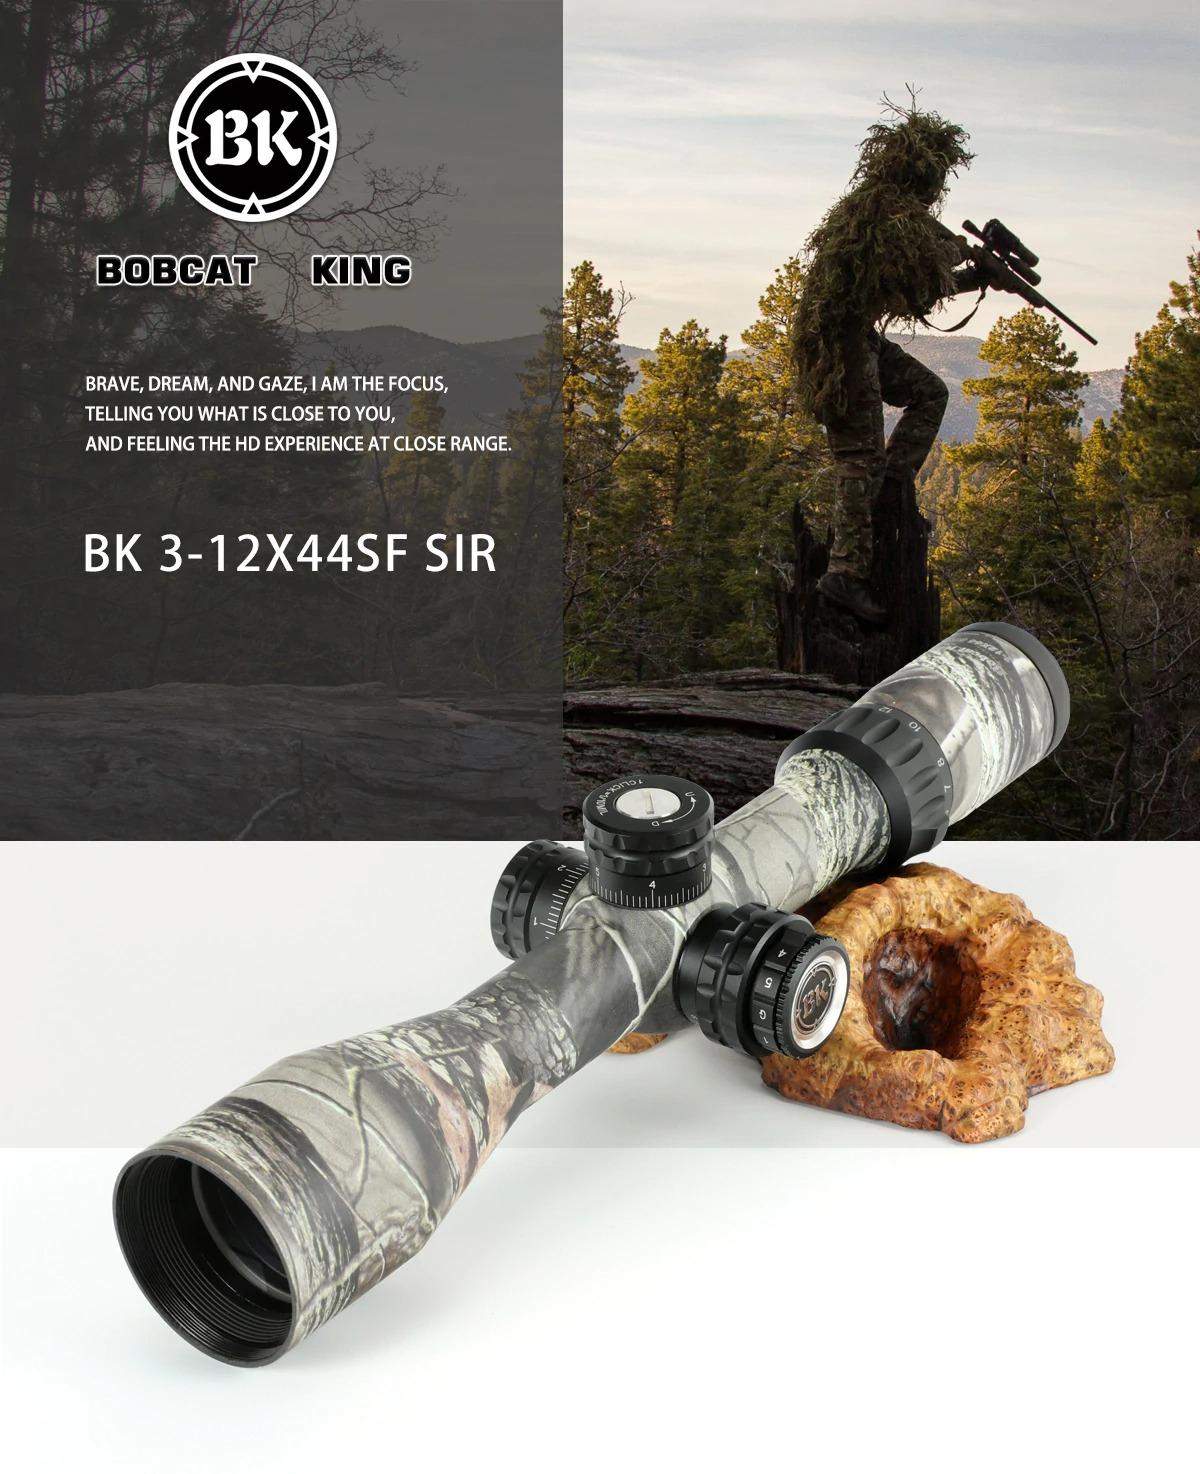 Bobcat King 3-12X44 SFIR Riflescope Airsoft Hunting Rifle Scope 1